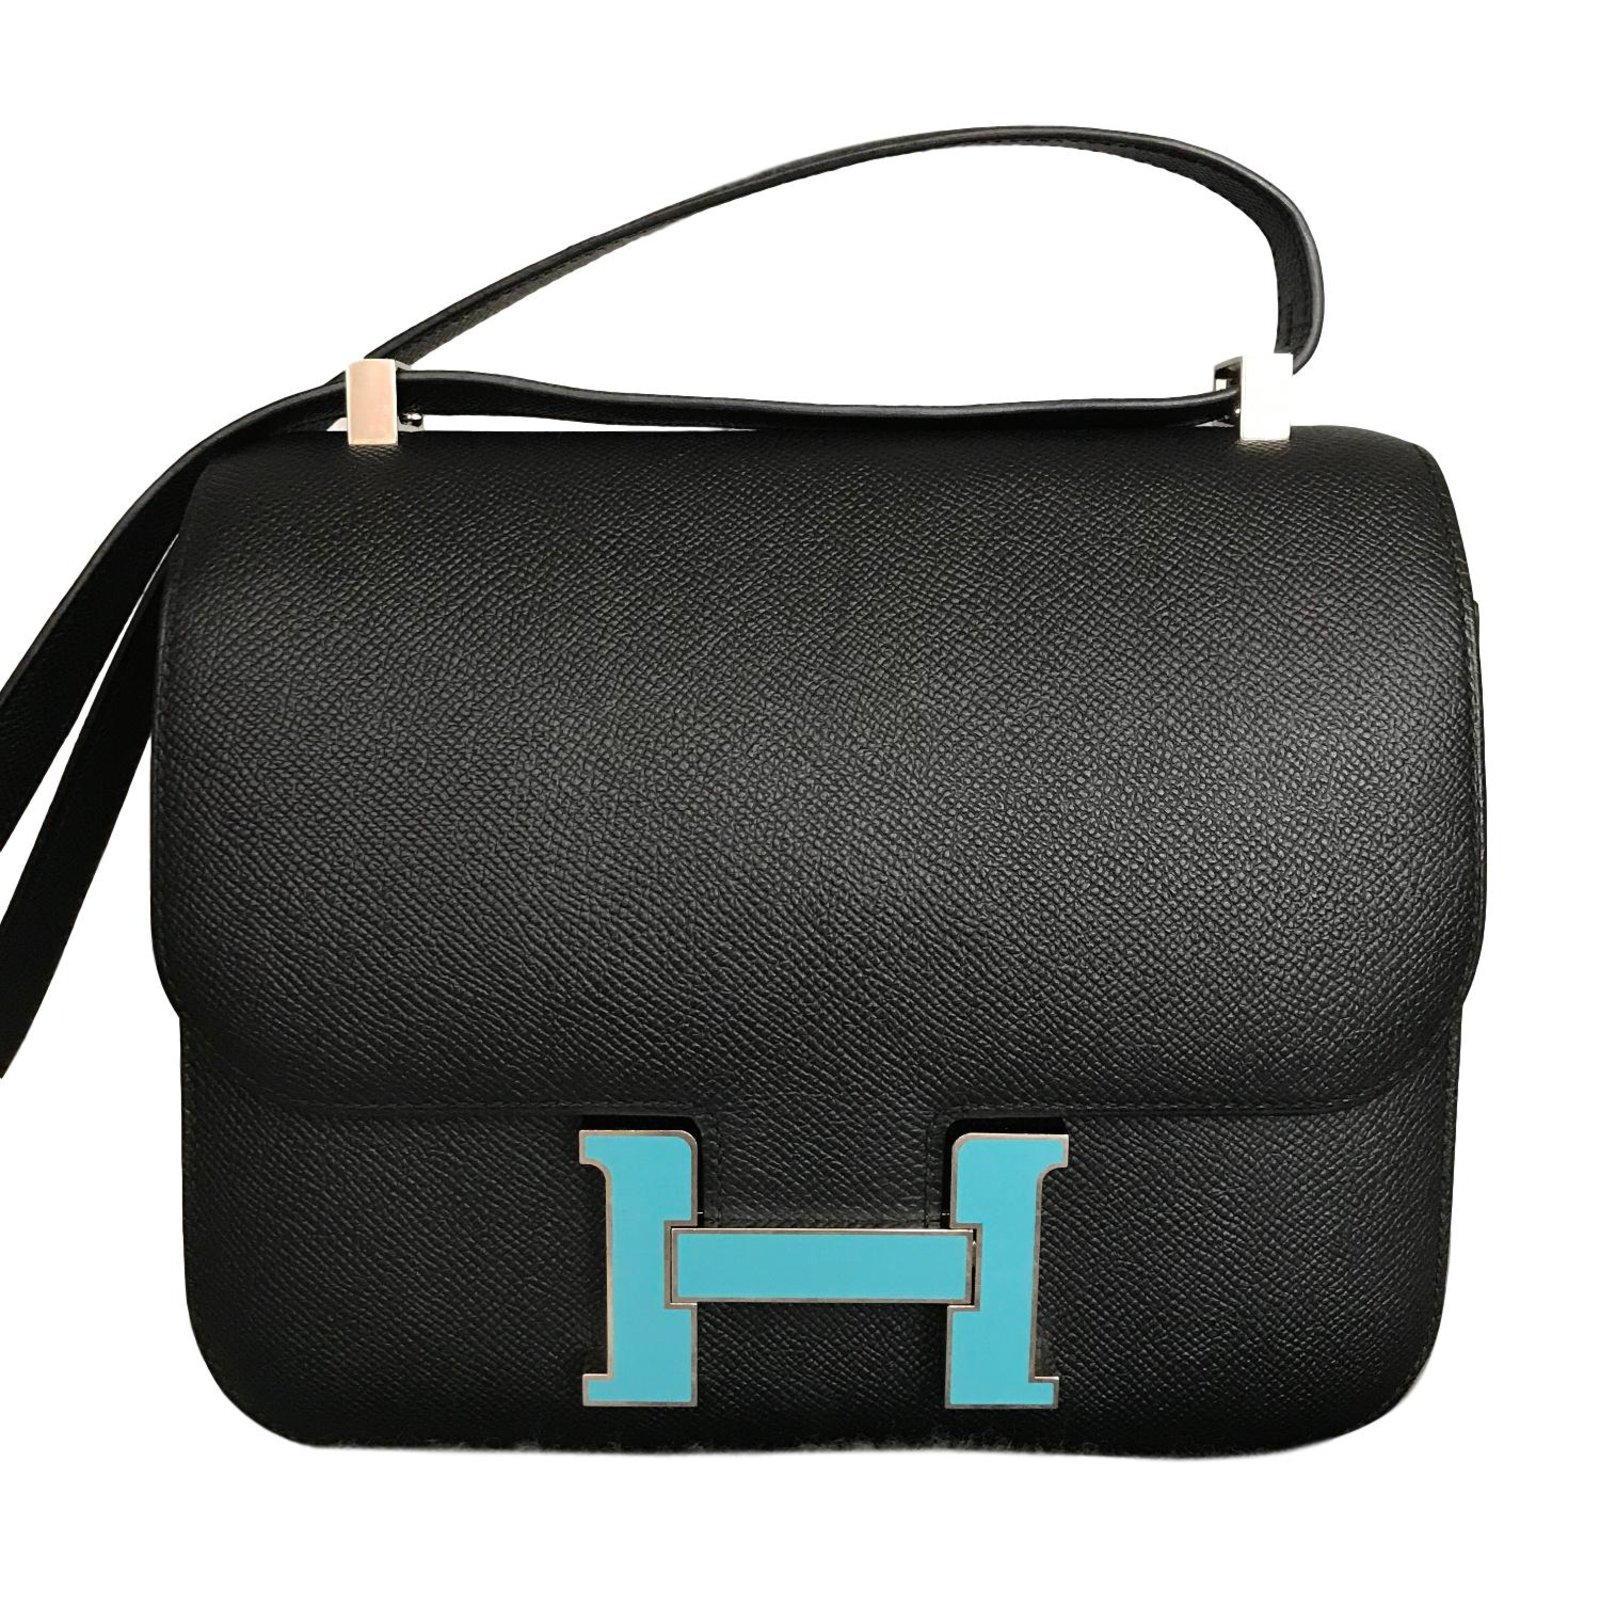 2a0b27ef5ee8 ... czech hermès constance 24 handbags leather black ref.71426 e17bd 5909e